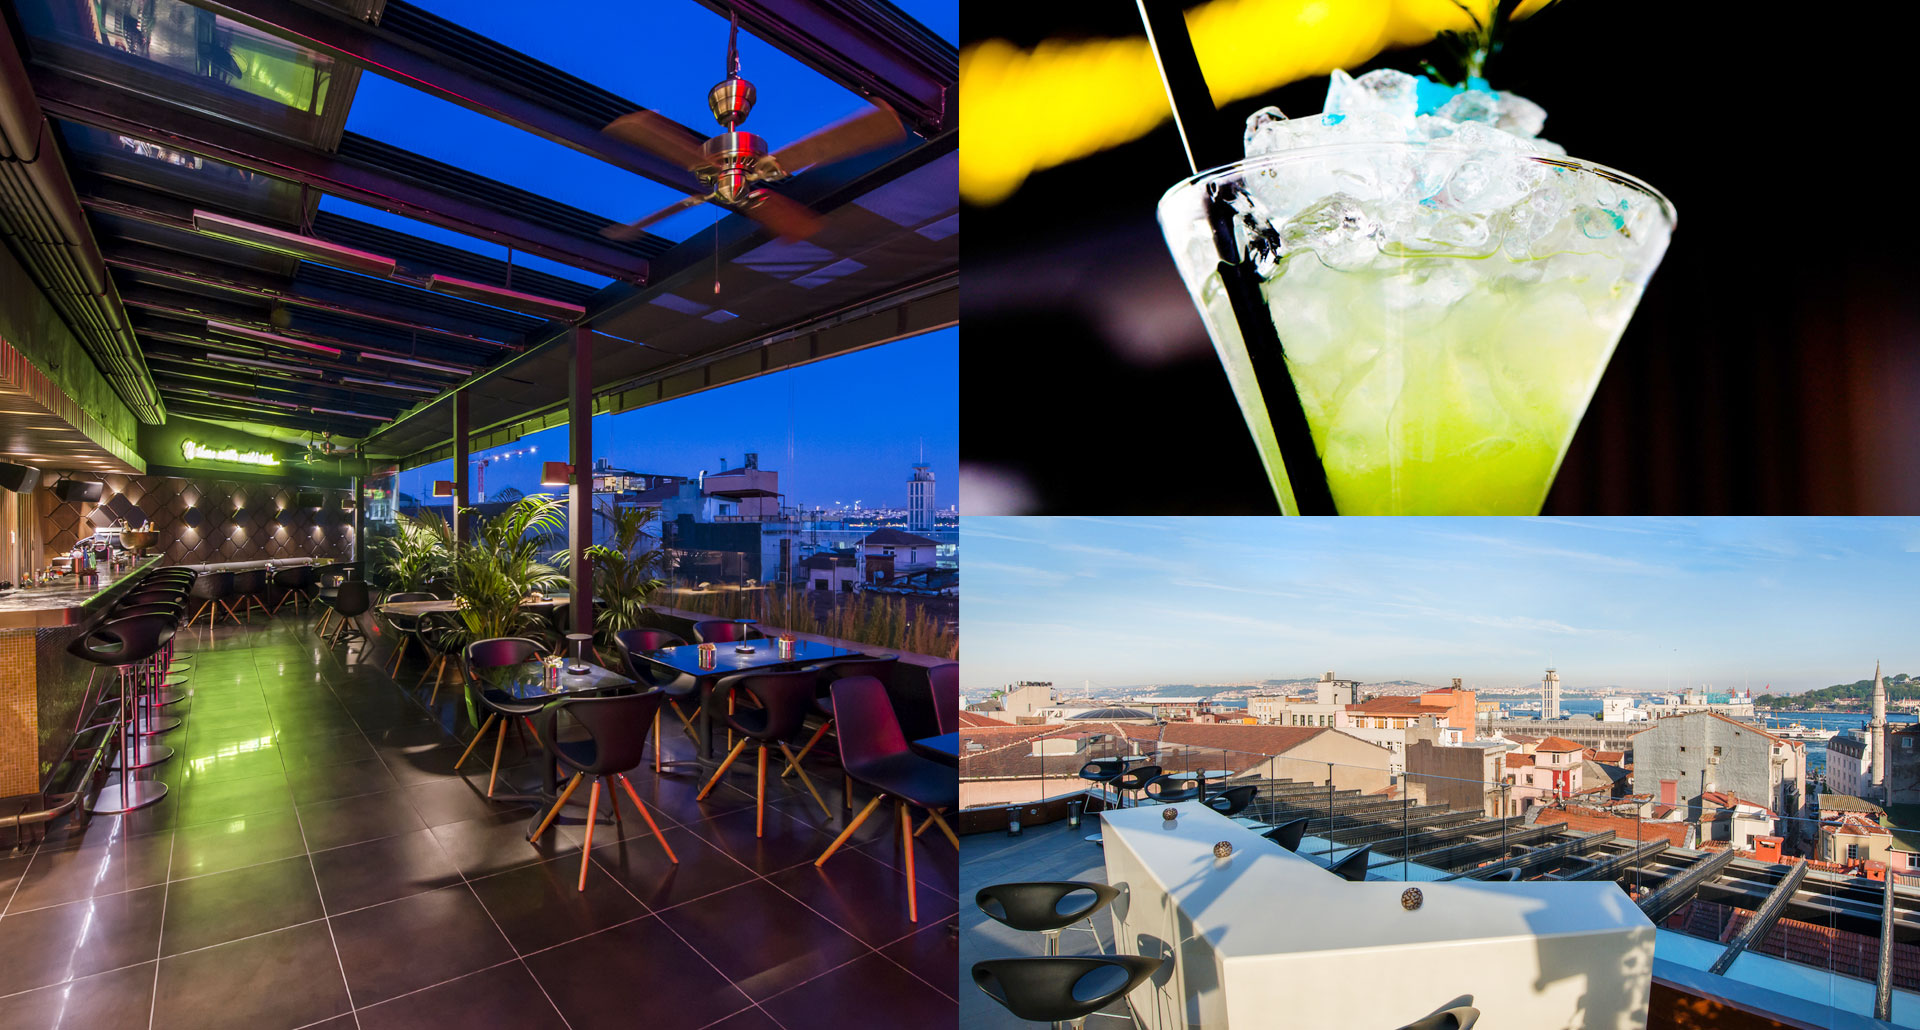 10 Karakoy, Istanbul - best nightlife boutique hotel in Istanbul, Turkey